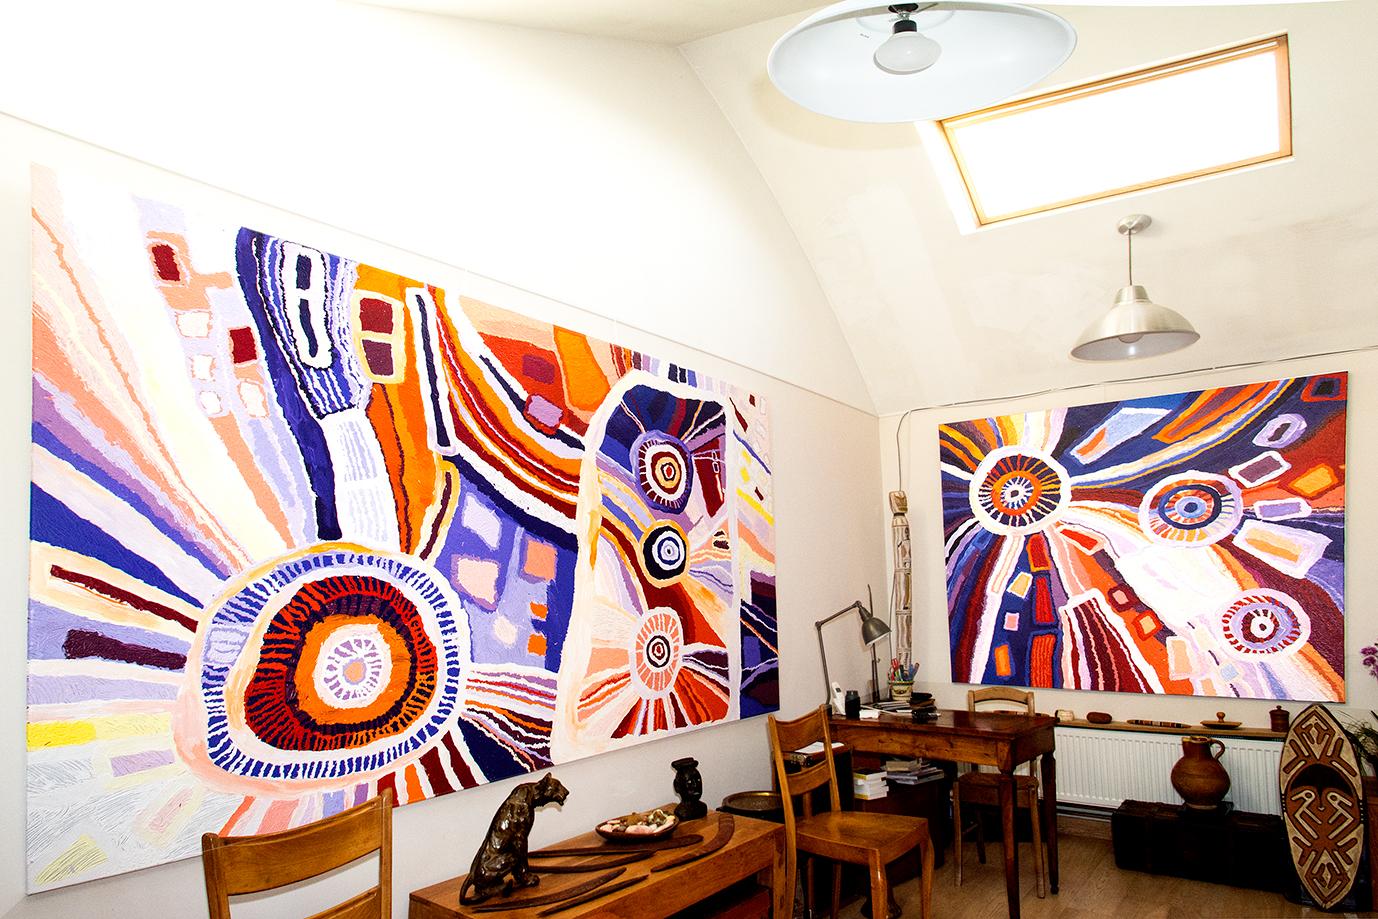 Deux peintures magistrales de l'artiste Aborigène Béryl Jimmy, Nyangatja Watarru. L'œuvre de gauche de 300 x 200 cm a été finaliste du NATSIAA Telstra Award 2016 au Musée National de Darwin. © Photo Aboriginal Signature • Estrangin gallery, with the courtesy of the artists and Tjungu Palya Arts.